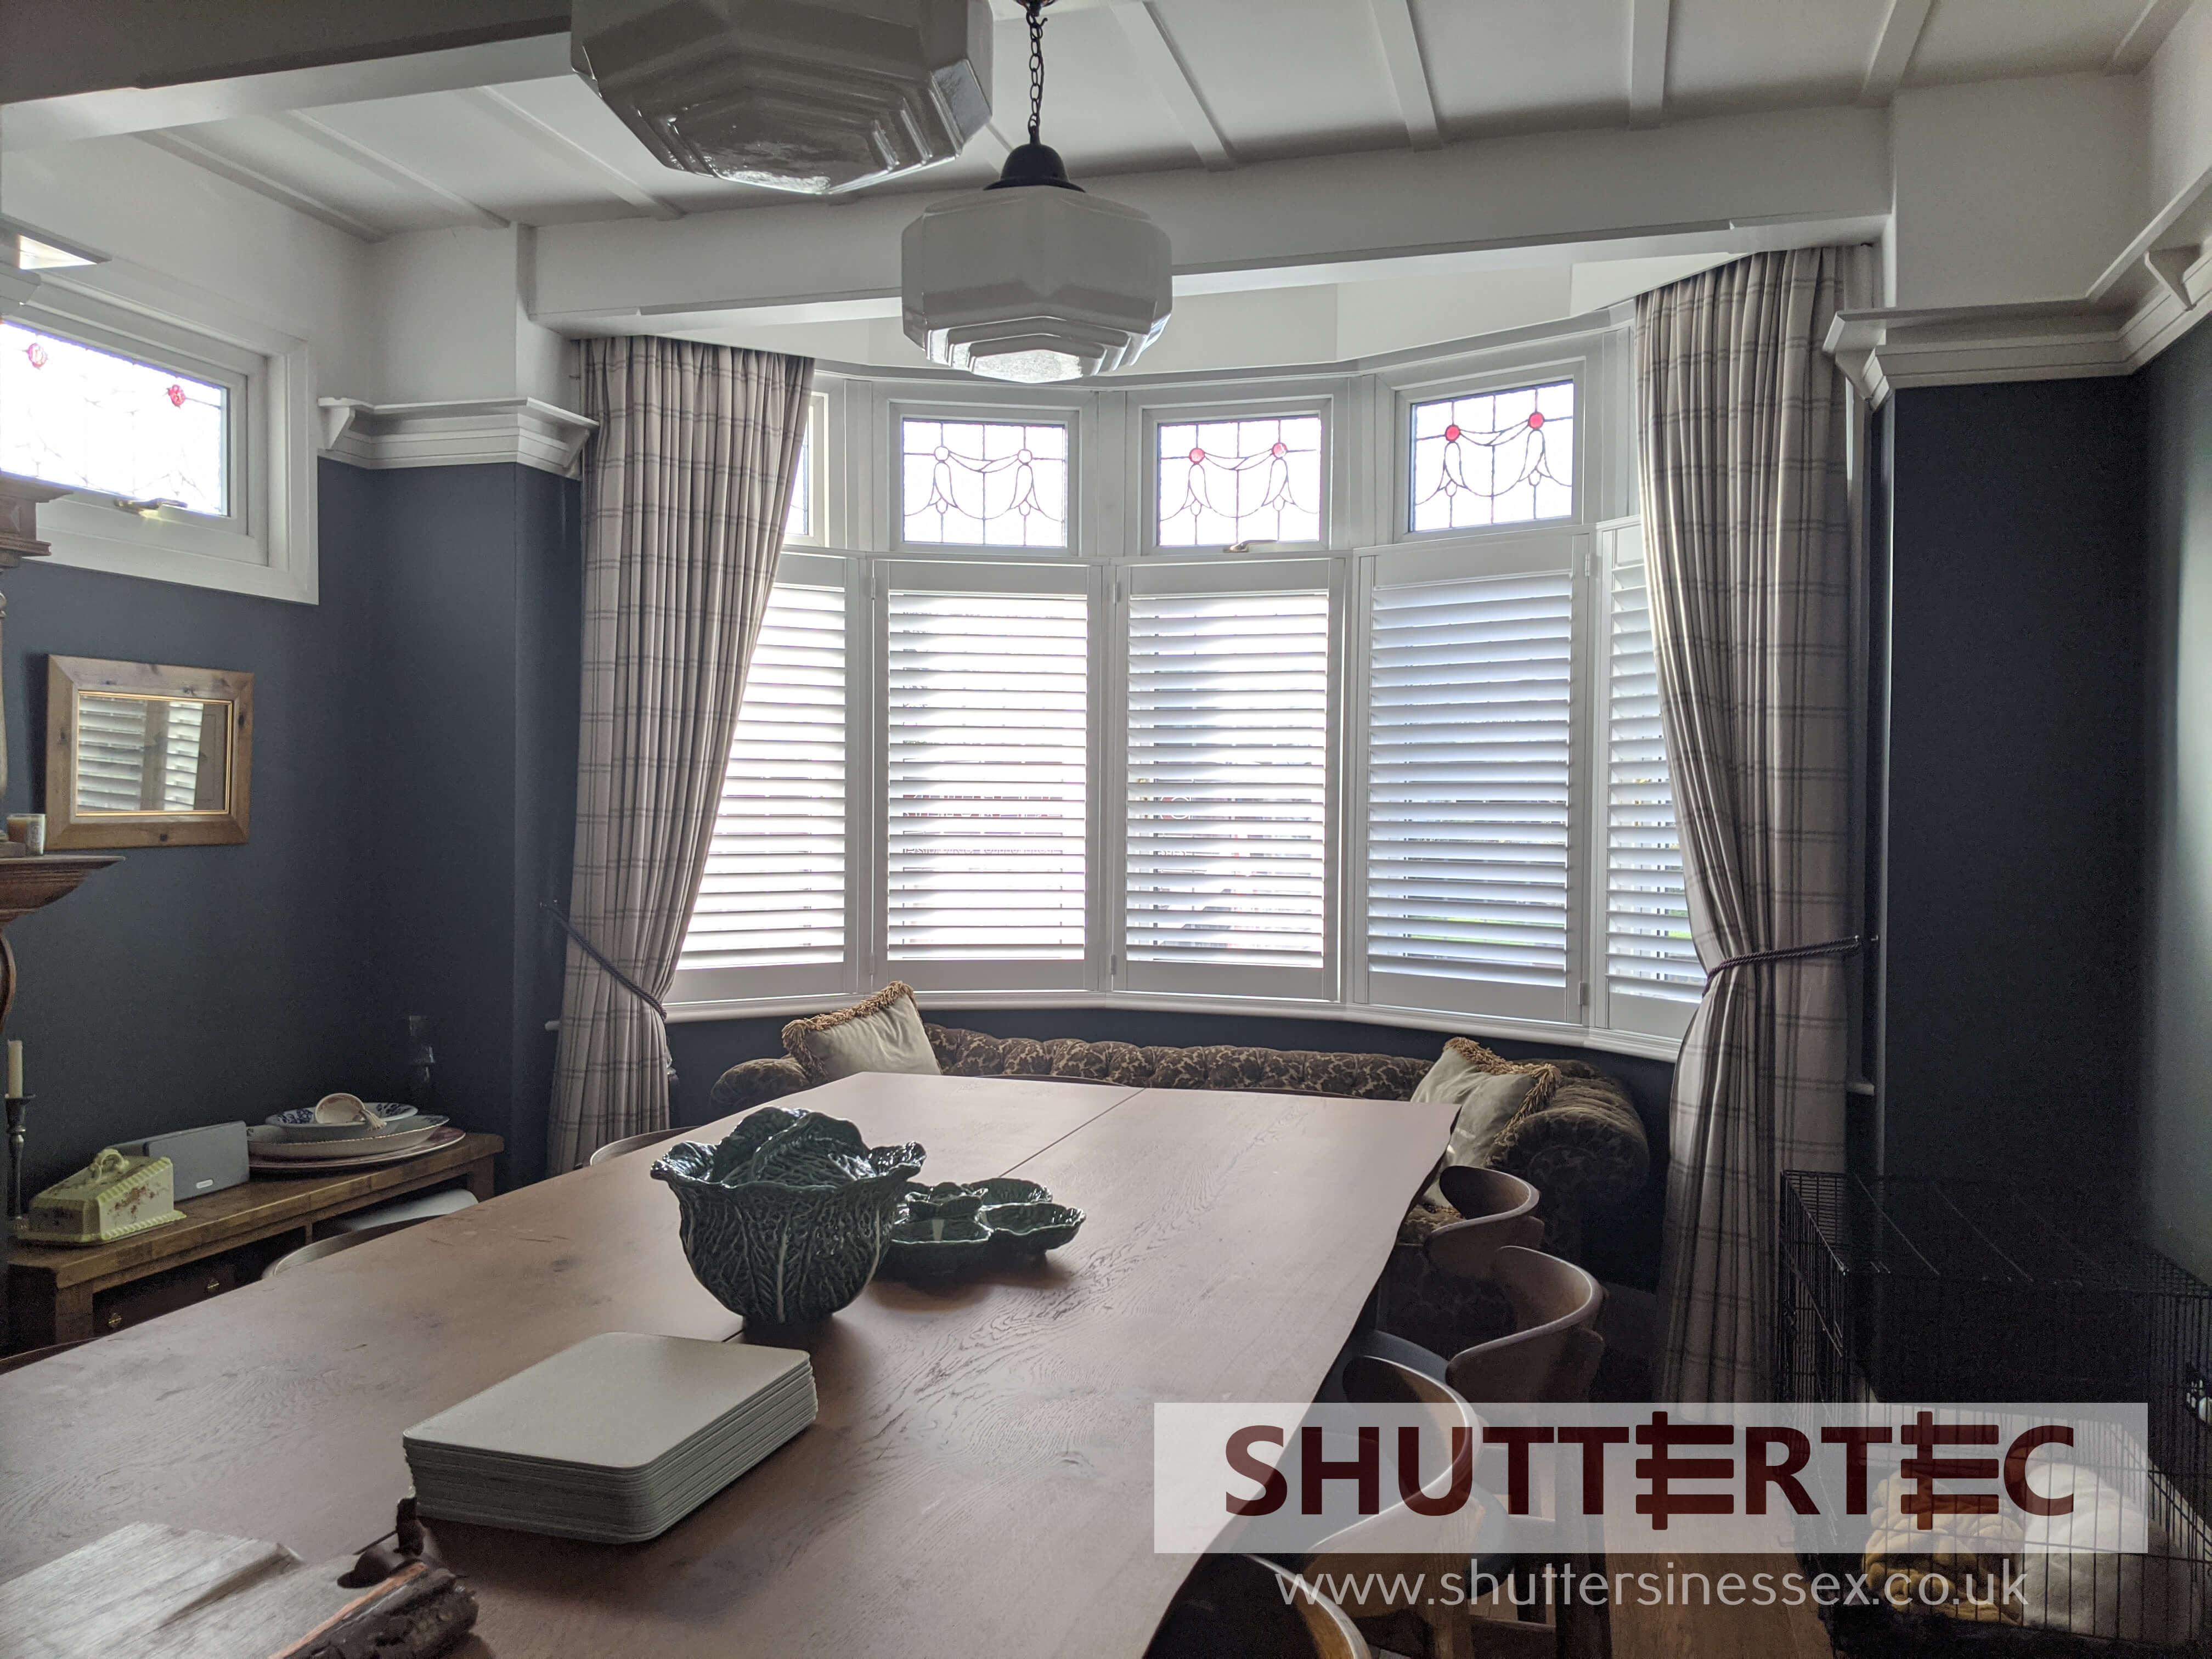 cafe style shutters on bay window